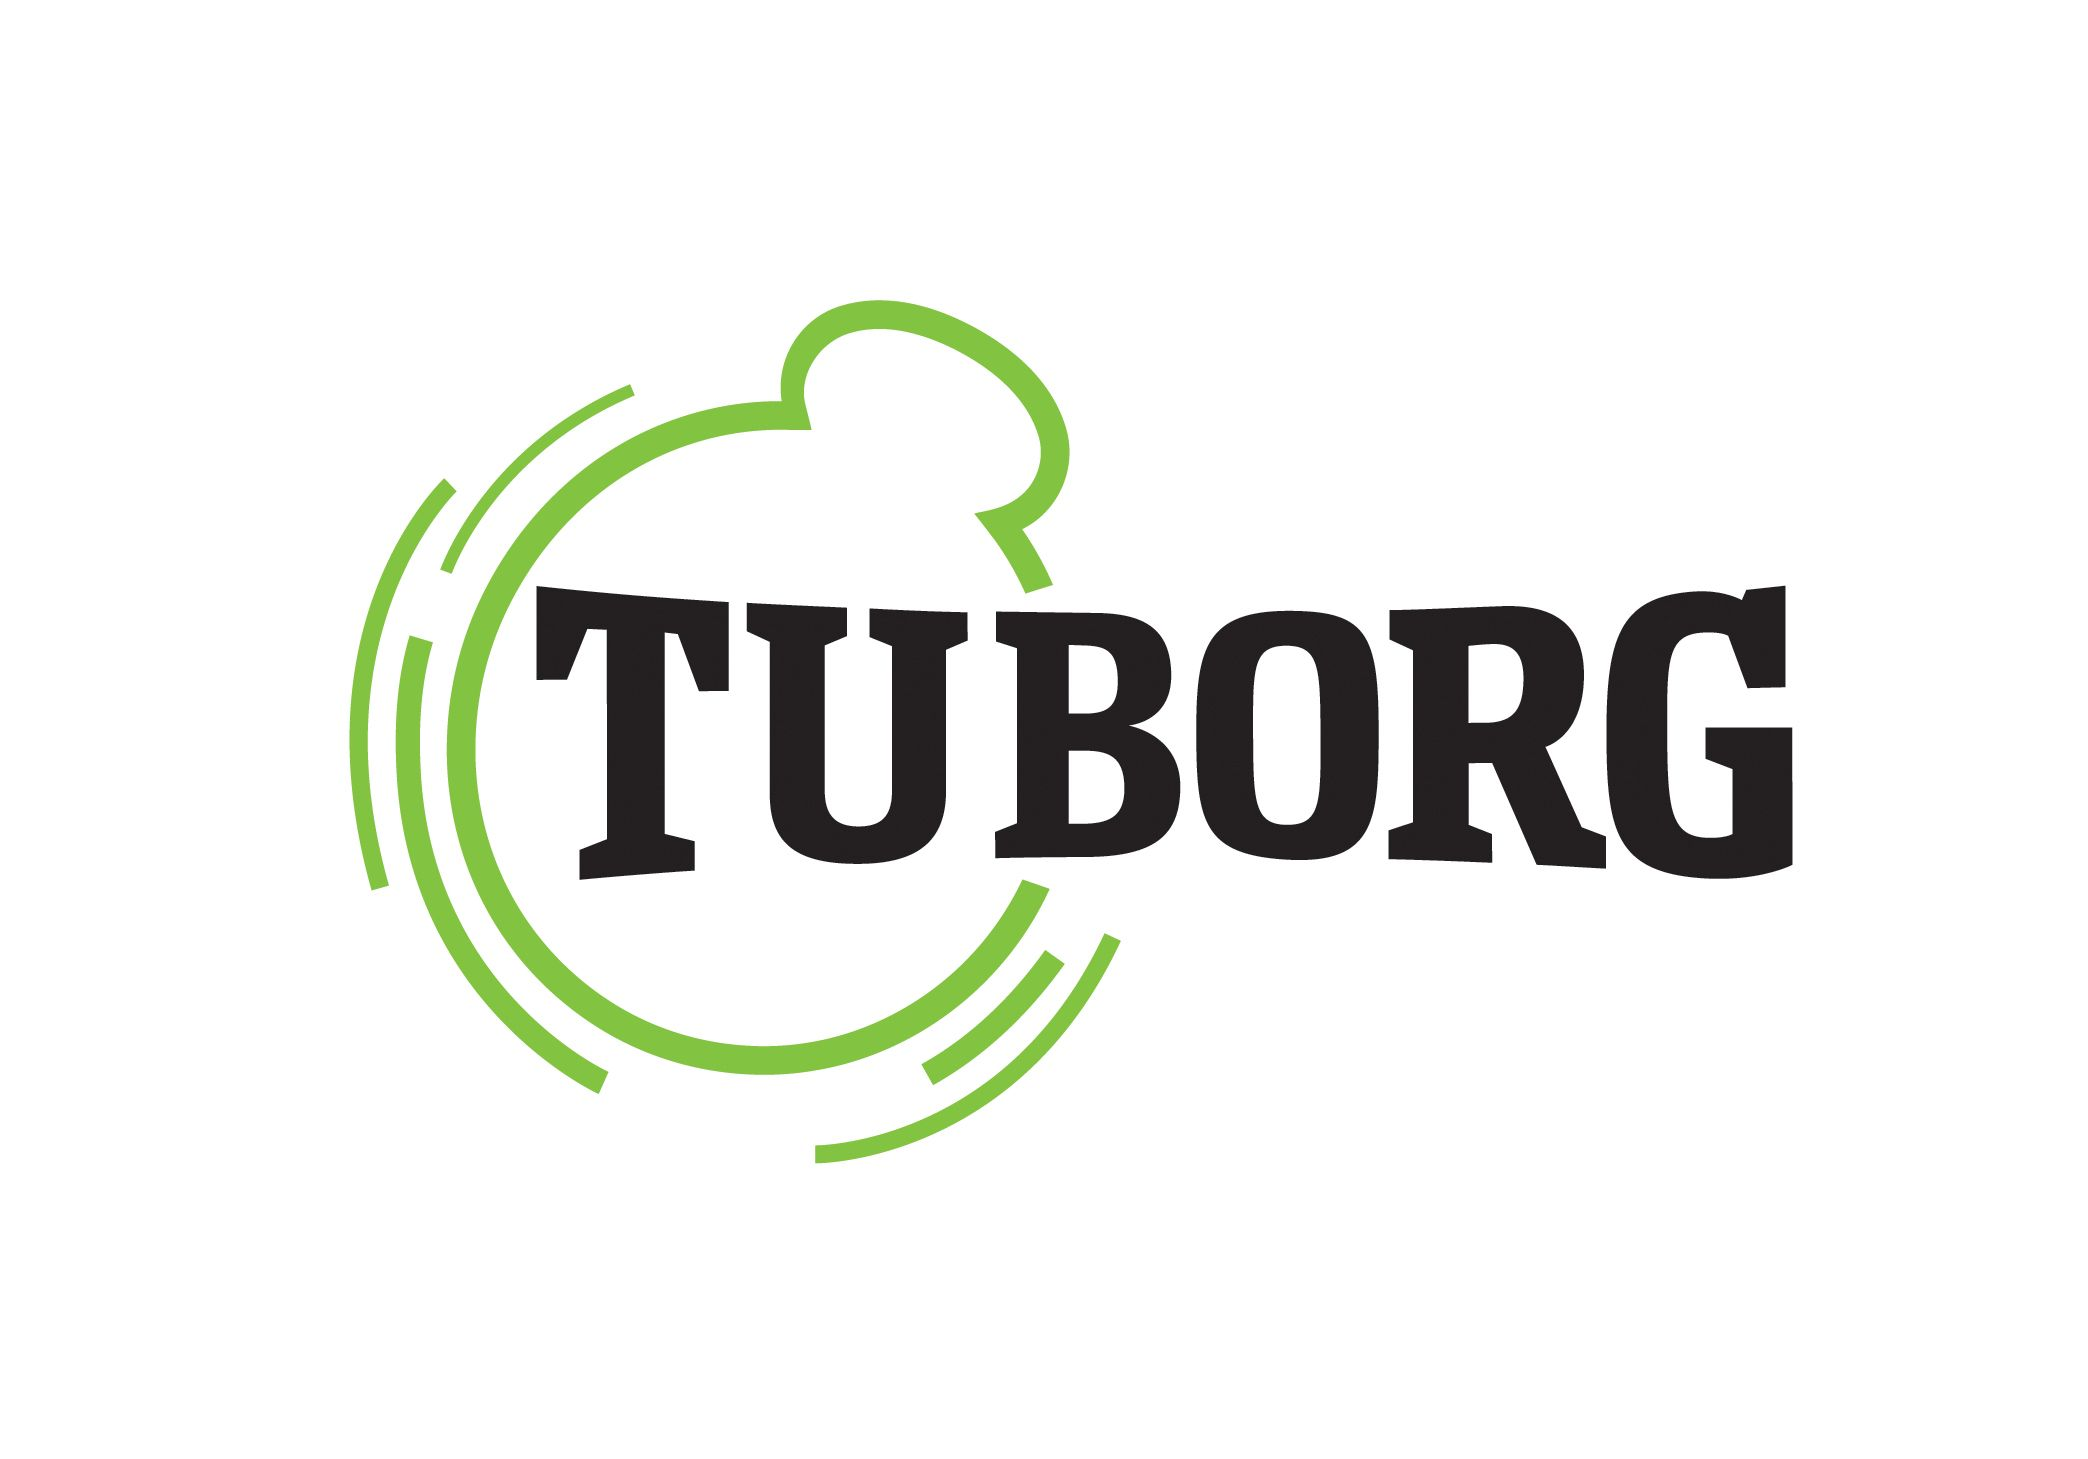 tuborg logo design by turner duckworth logos design logo word